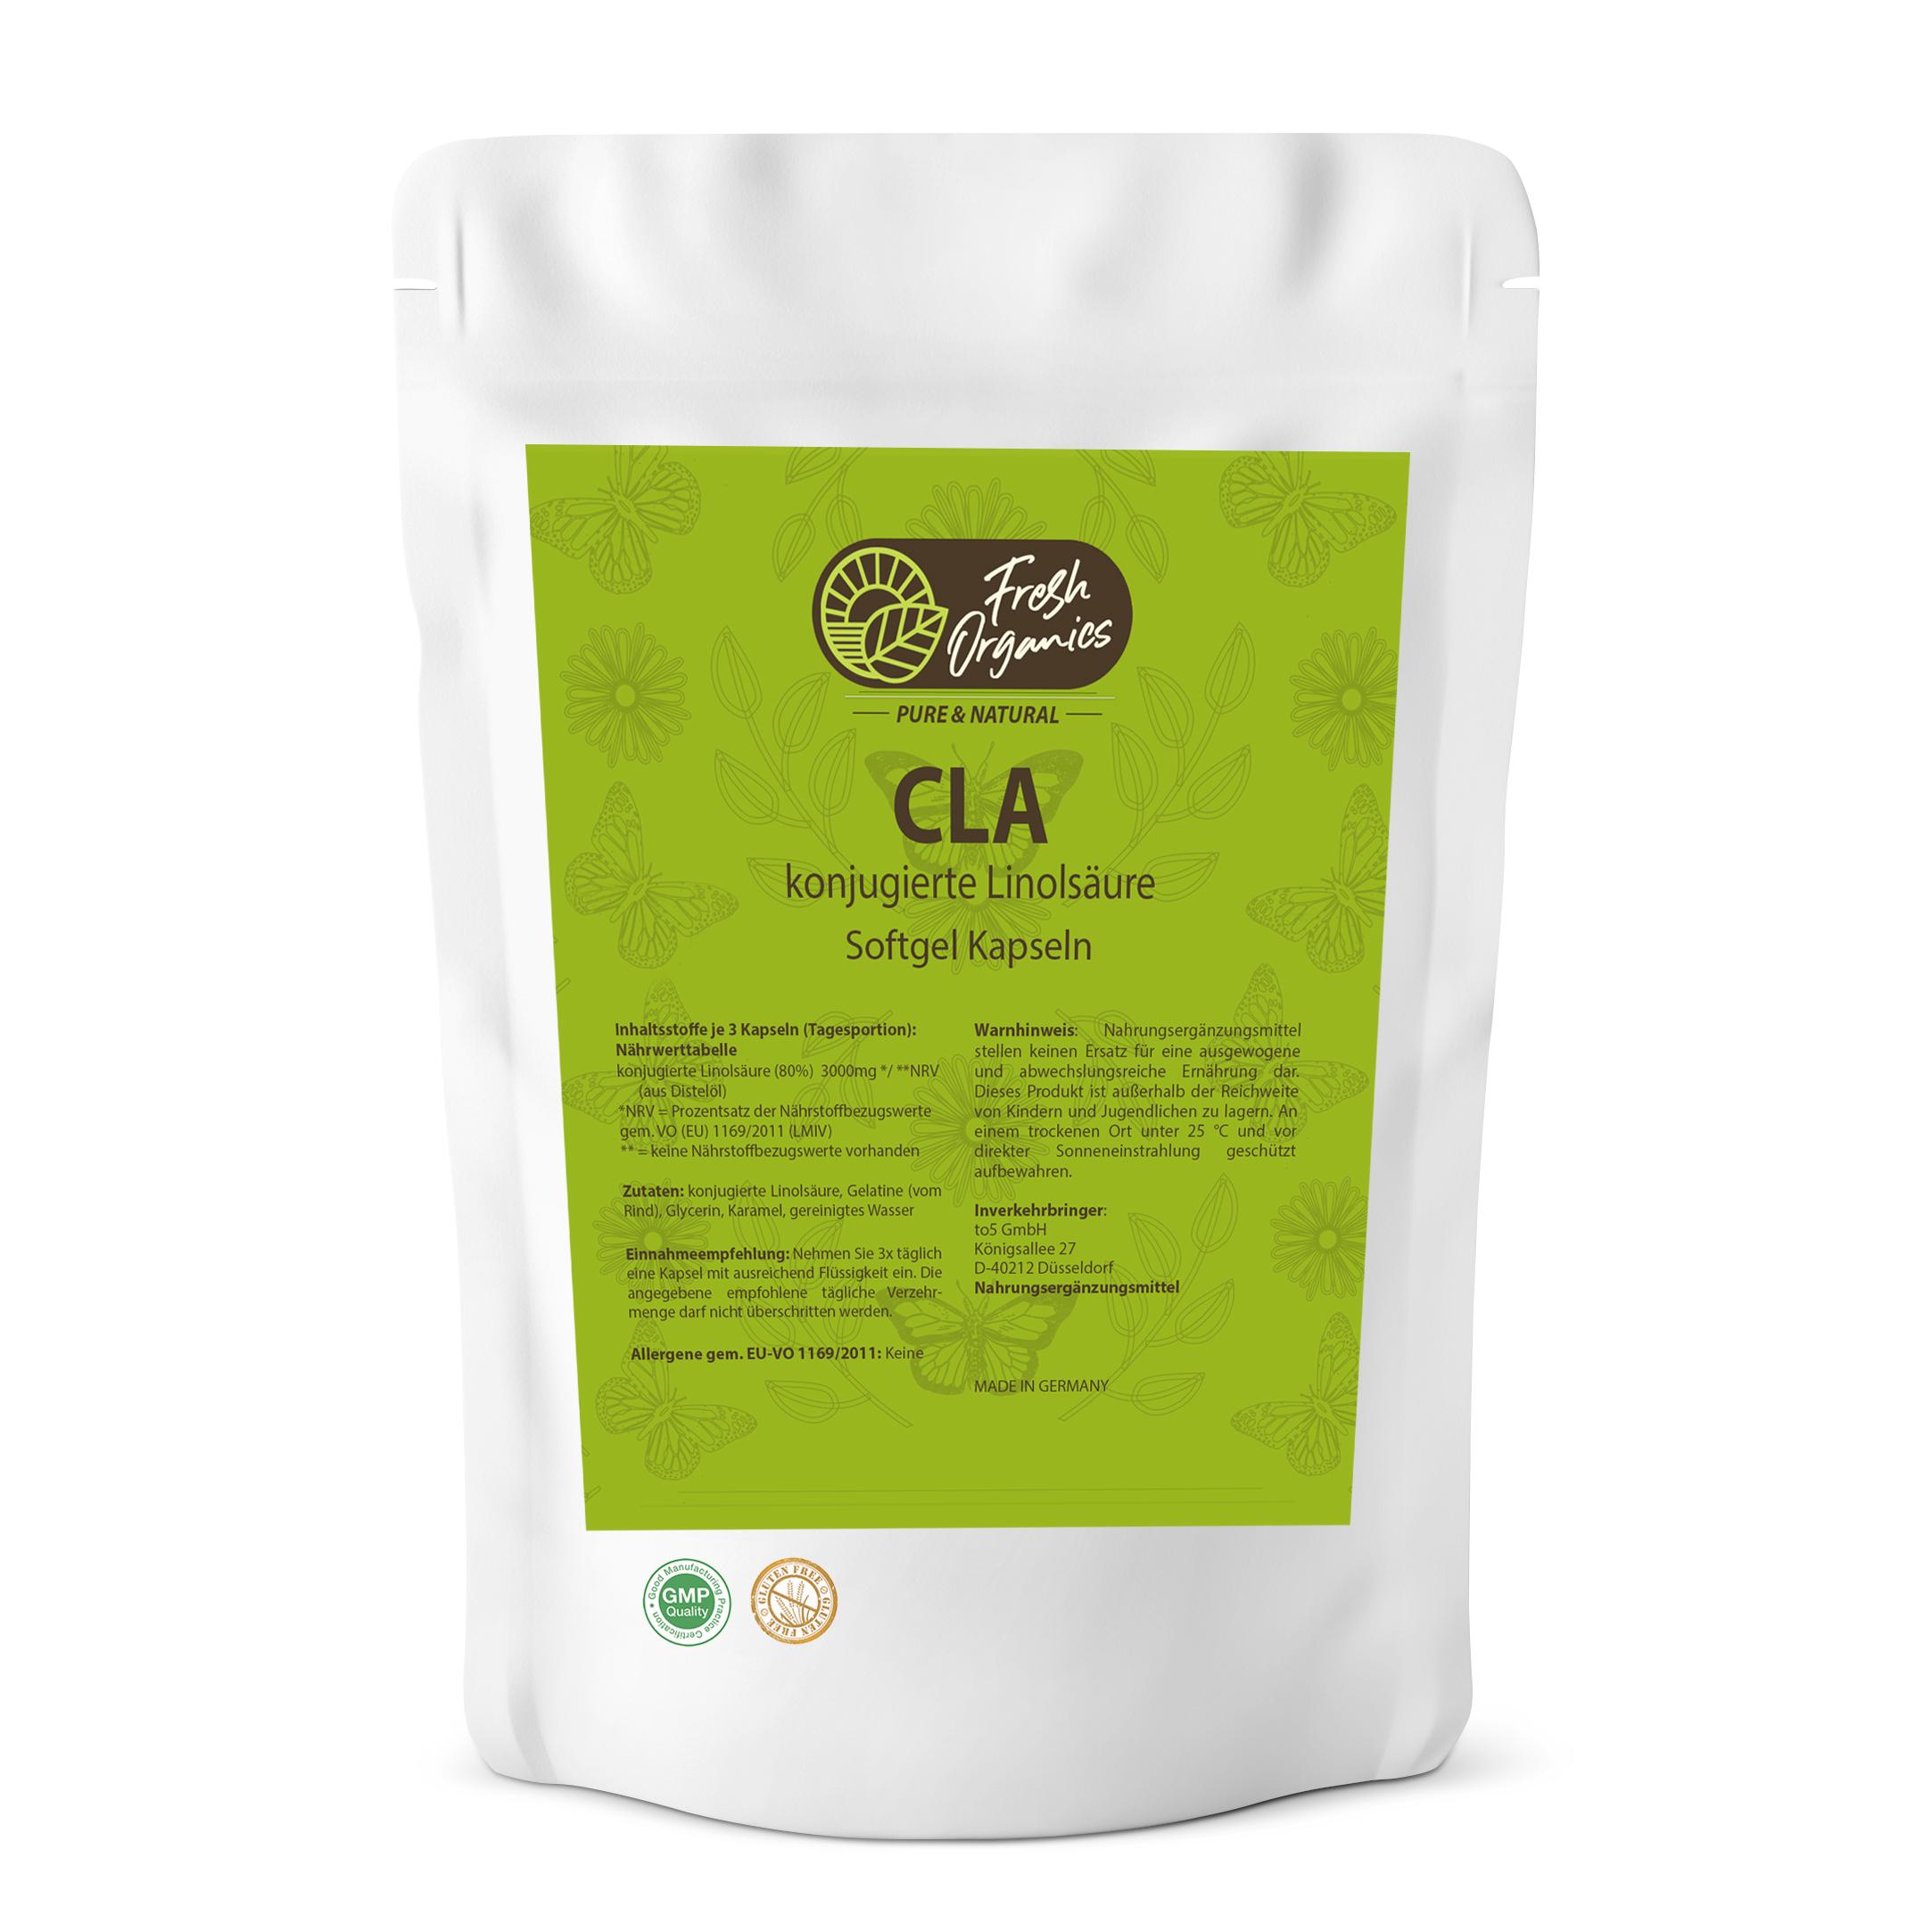 CLA Softgel-Kapseln Hochdosiert á 1000mg - konjugierte Linolsäure - natürliche Fettverbrennung + Muskelaufbau